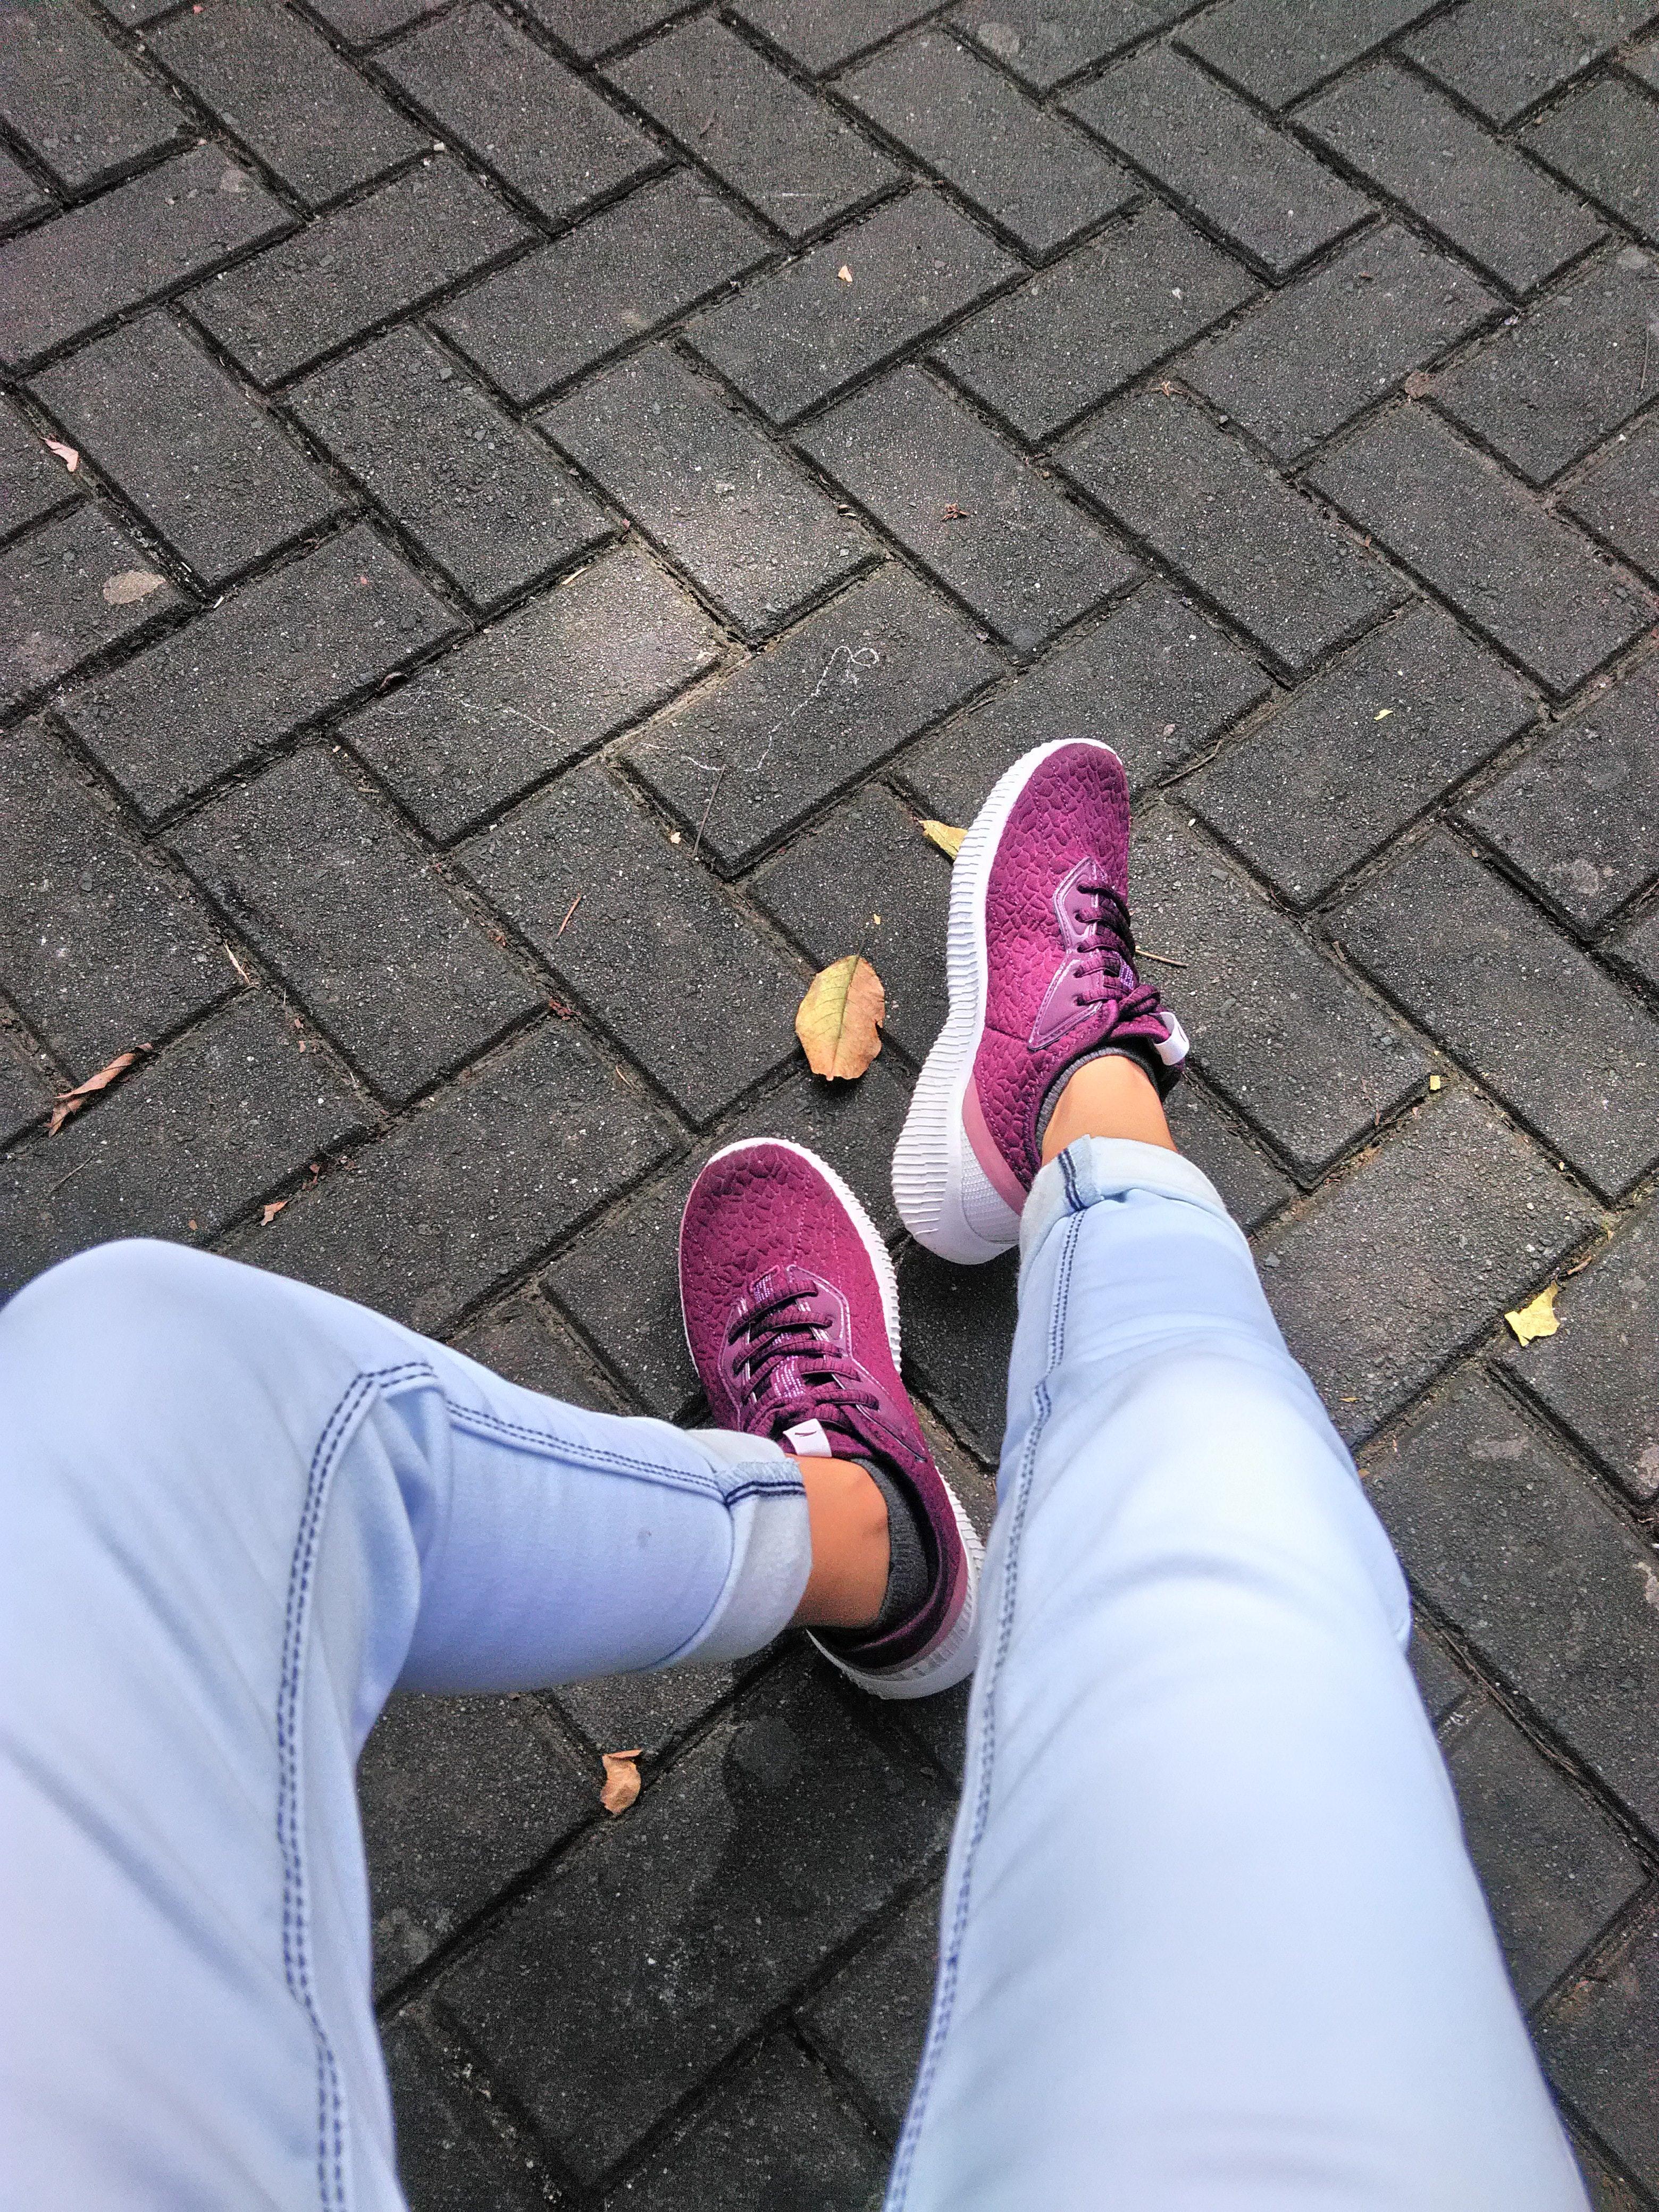 Light Up Louboutin Cinderella Shoes